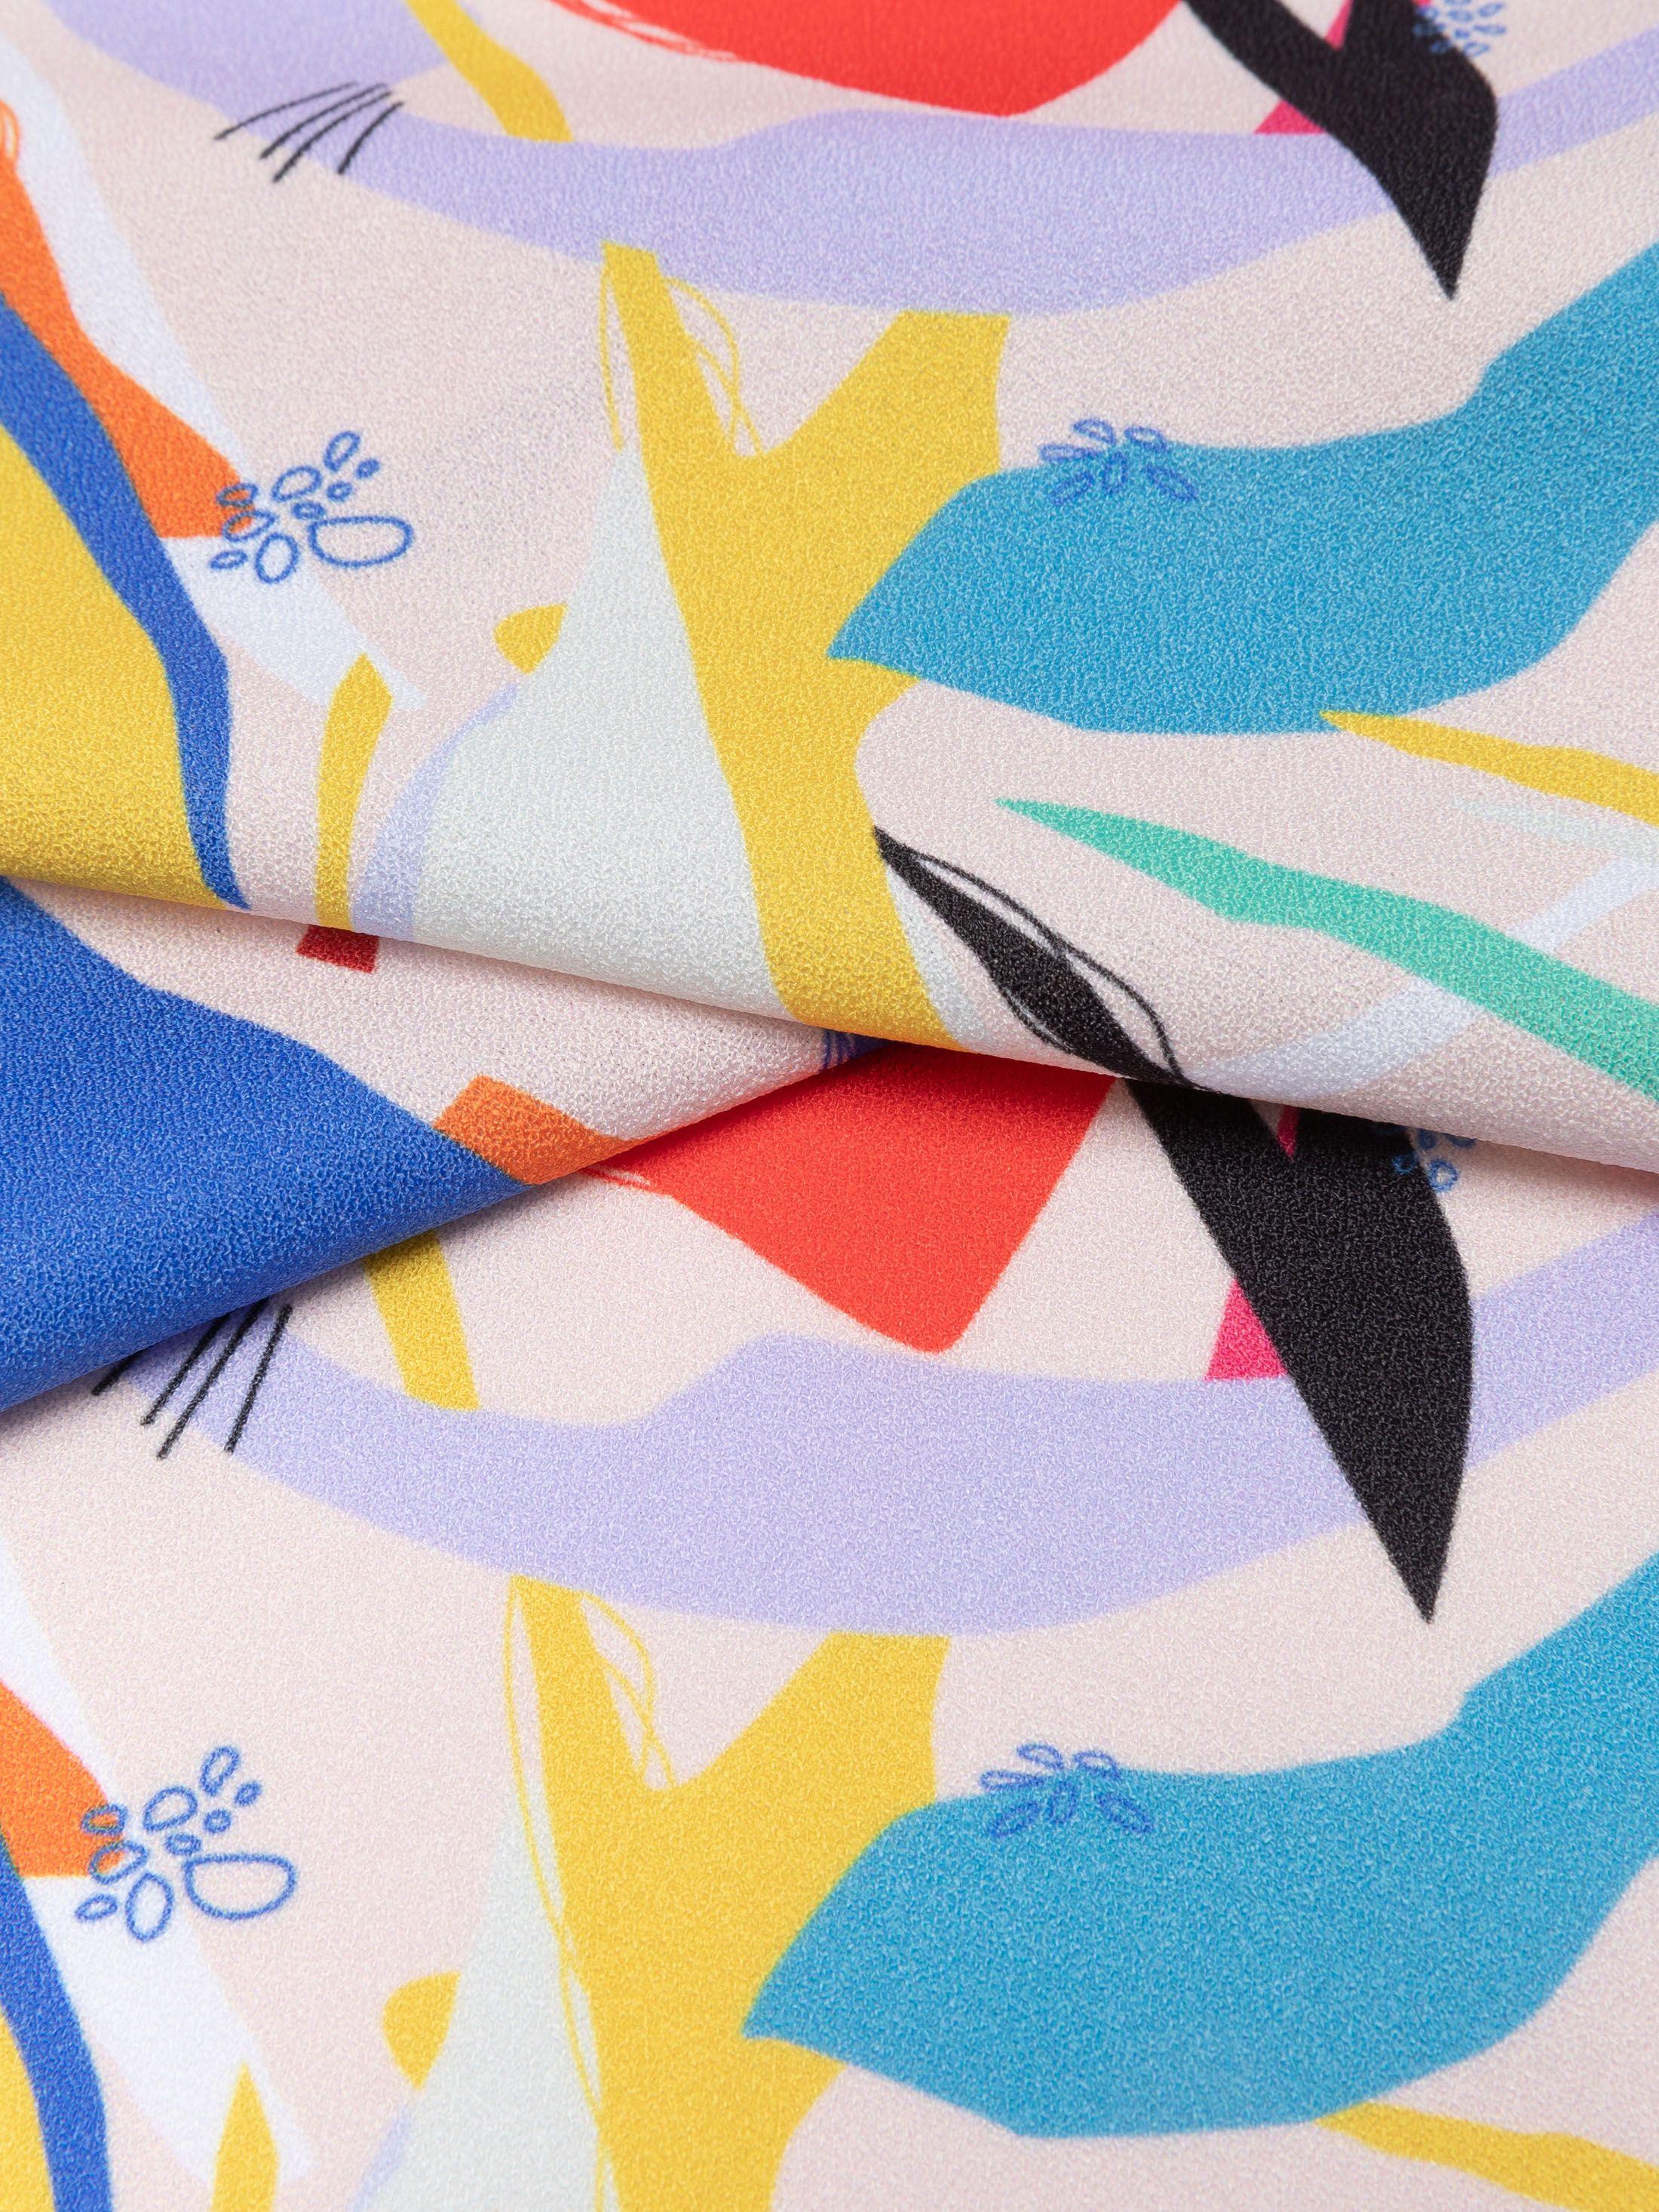 stretch crepe fabric